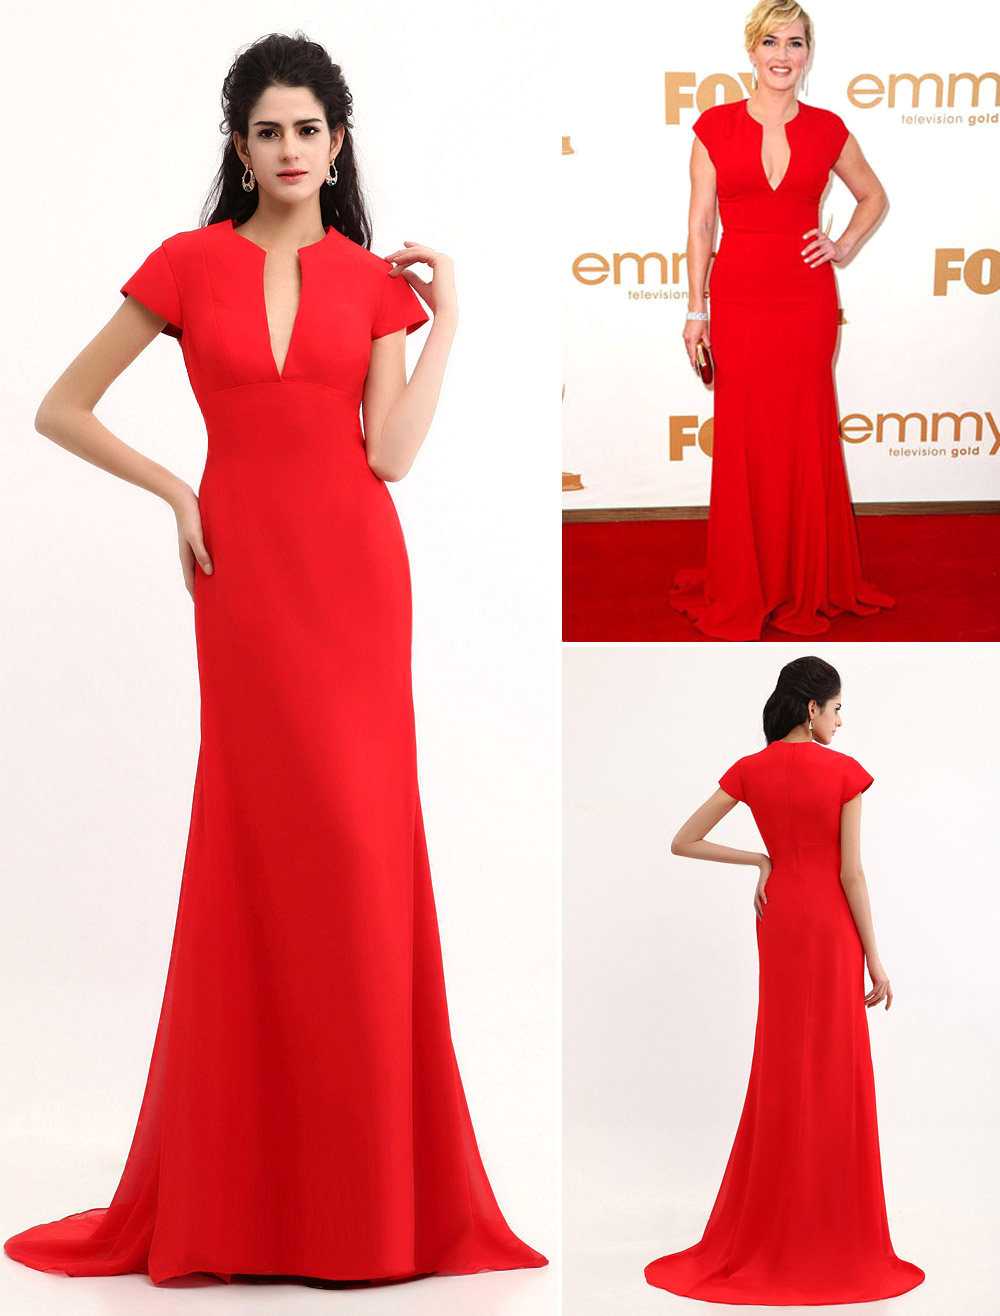 Red Kate Winslet Floor Length Chiffon Emmy Awards Dress